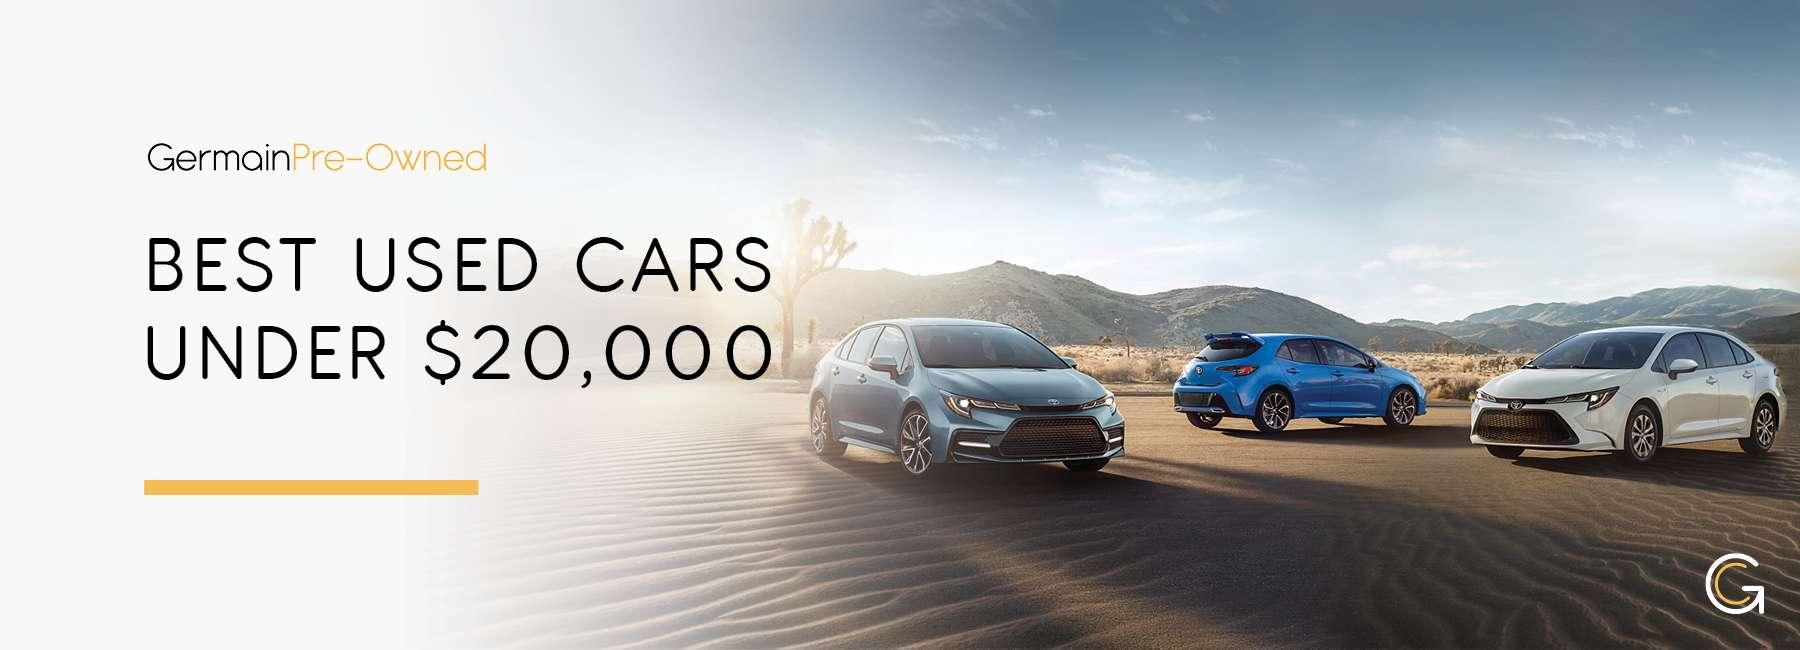 GermainCars Best New Cars Under $20,000